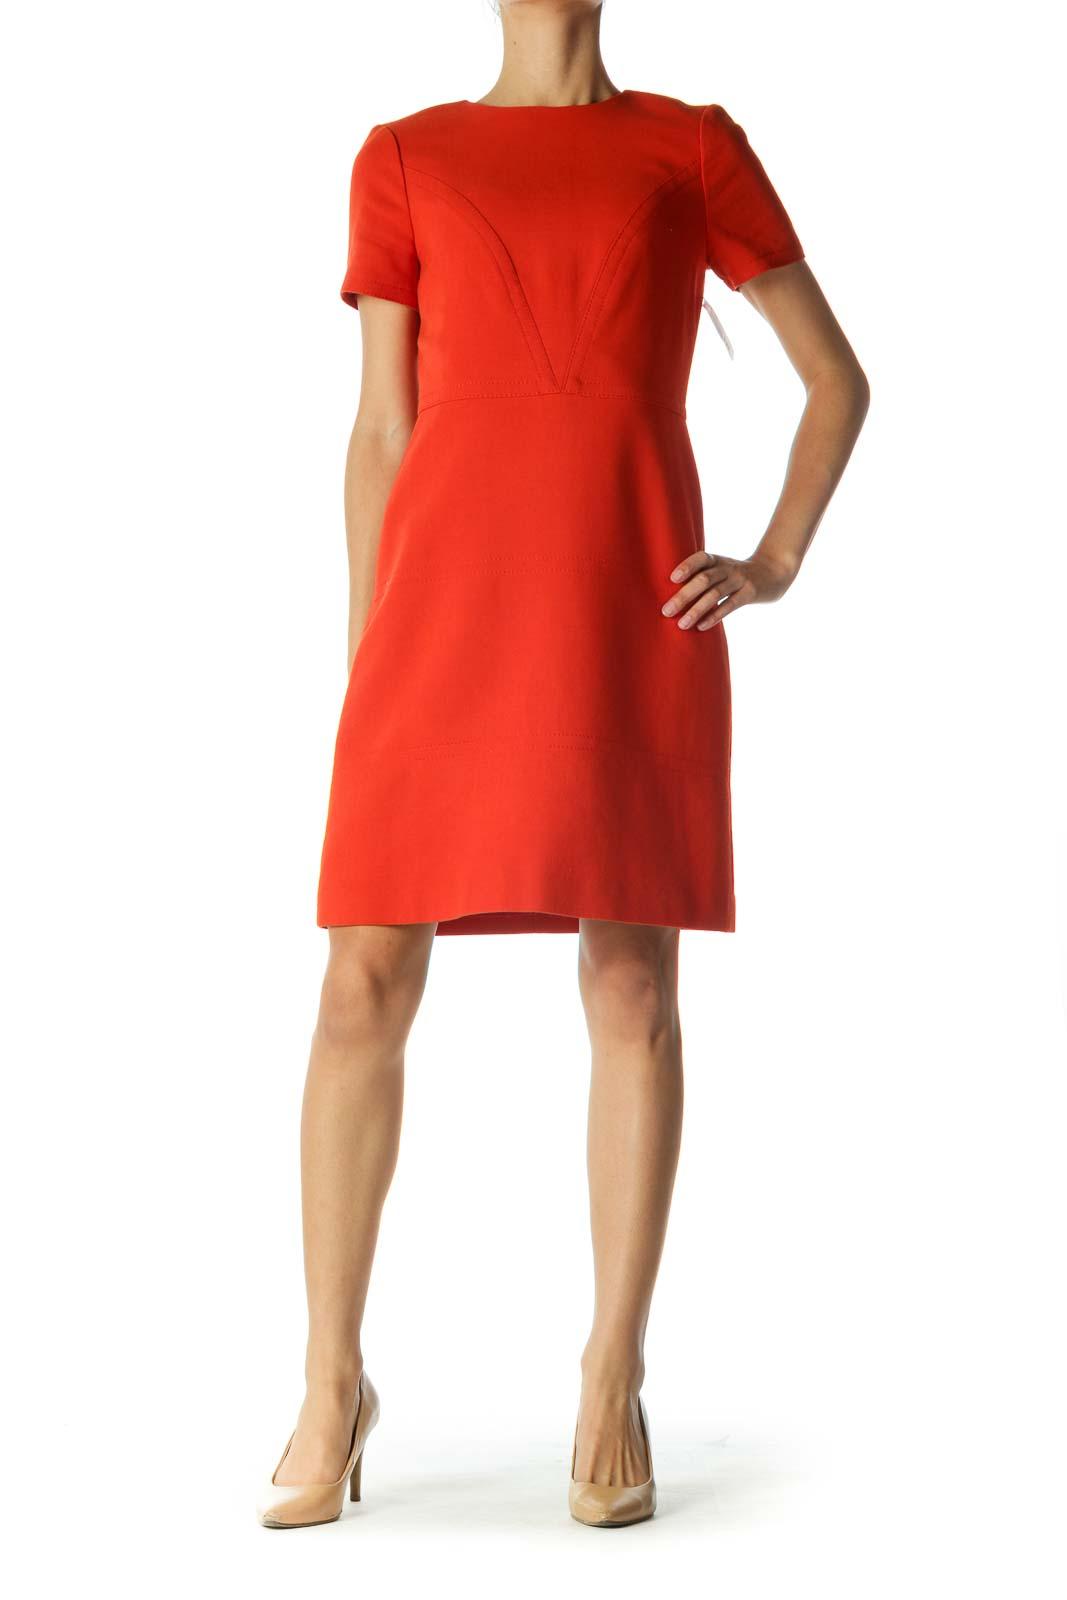 Orange Short Sleeve Work Dress